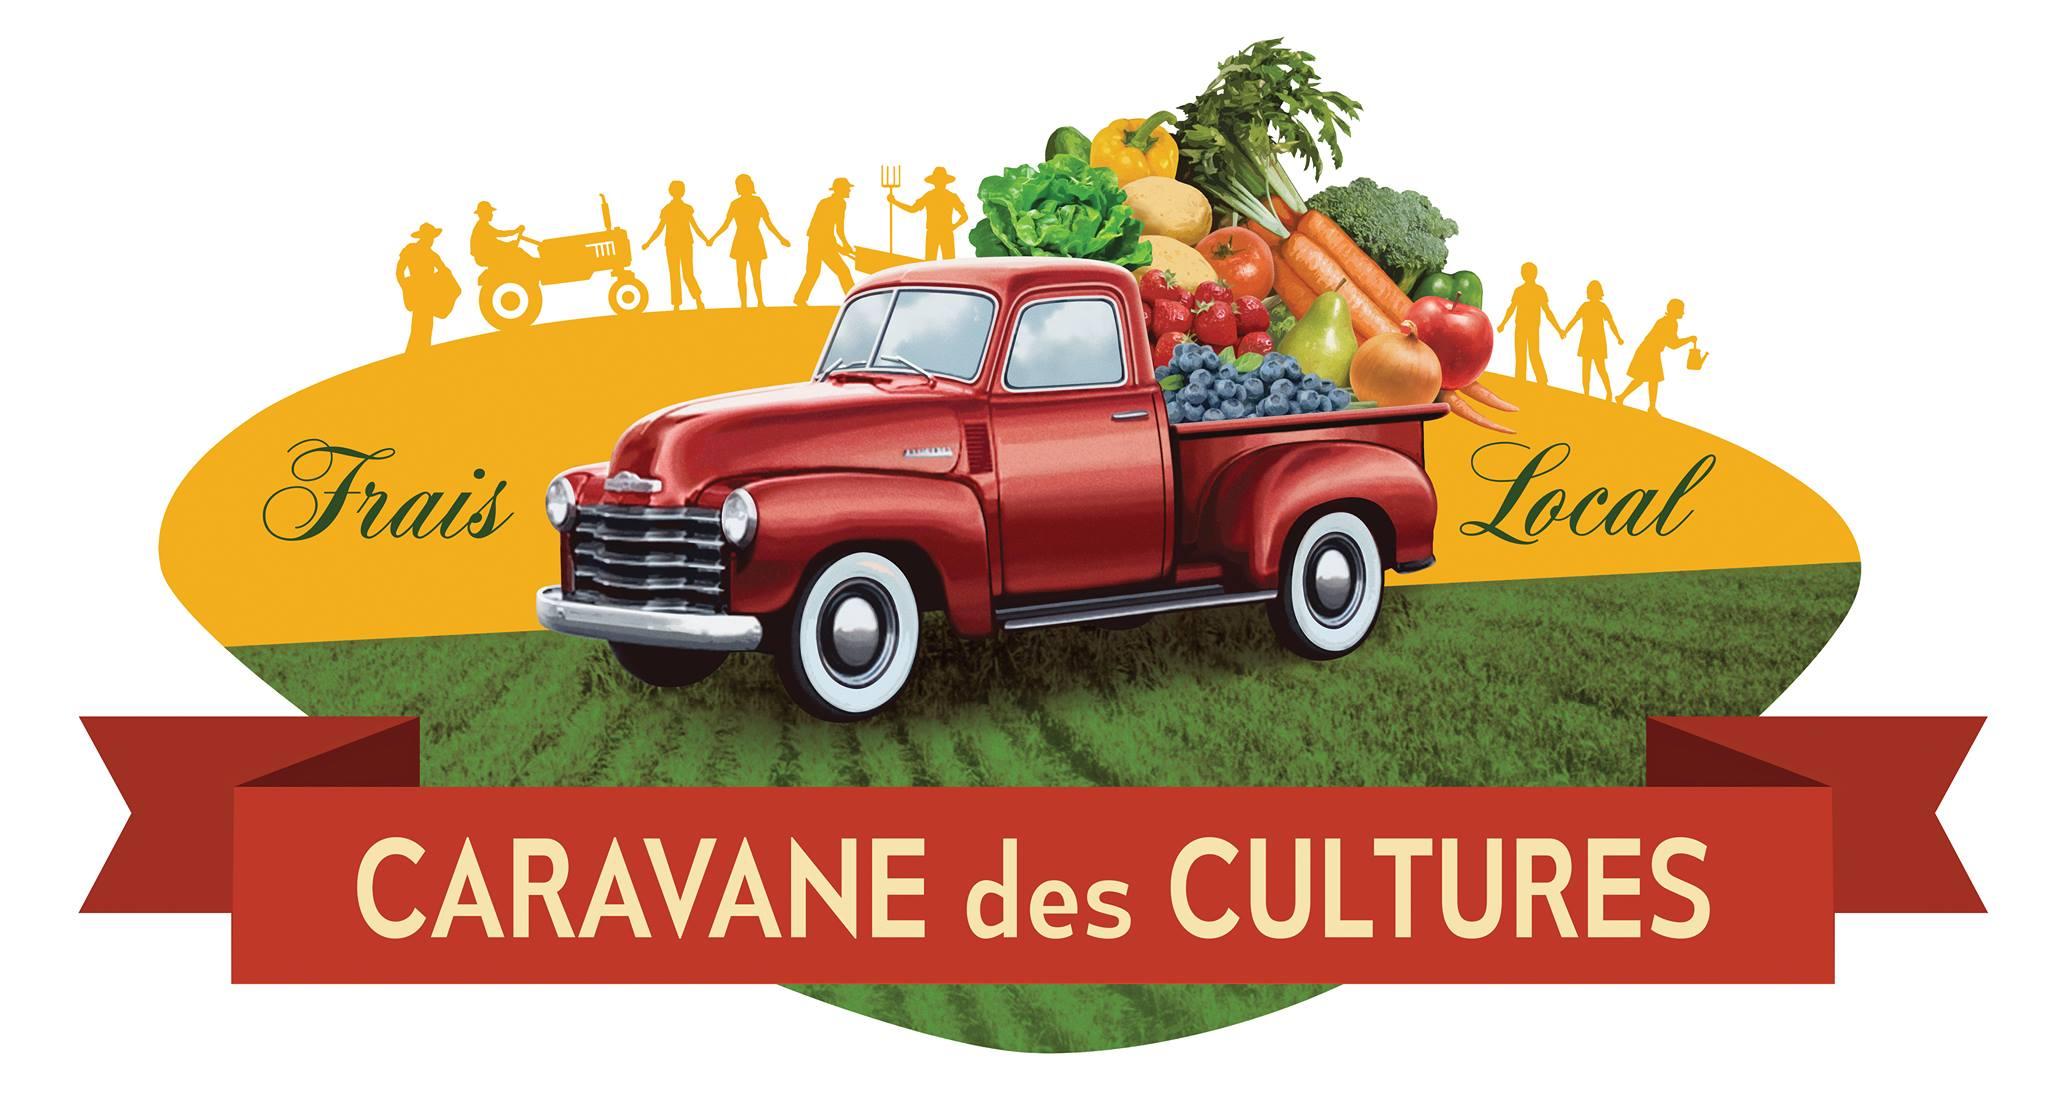 Caravane des Cultures - Logo